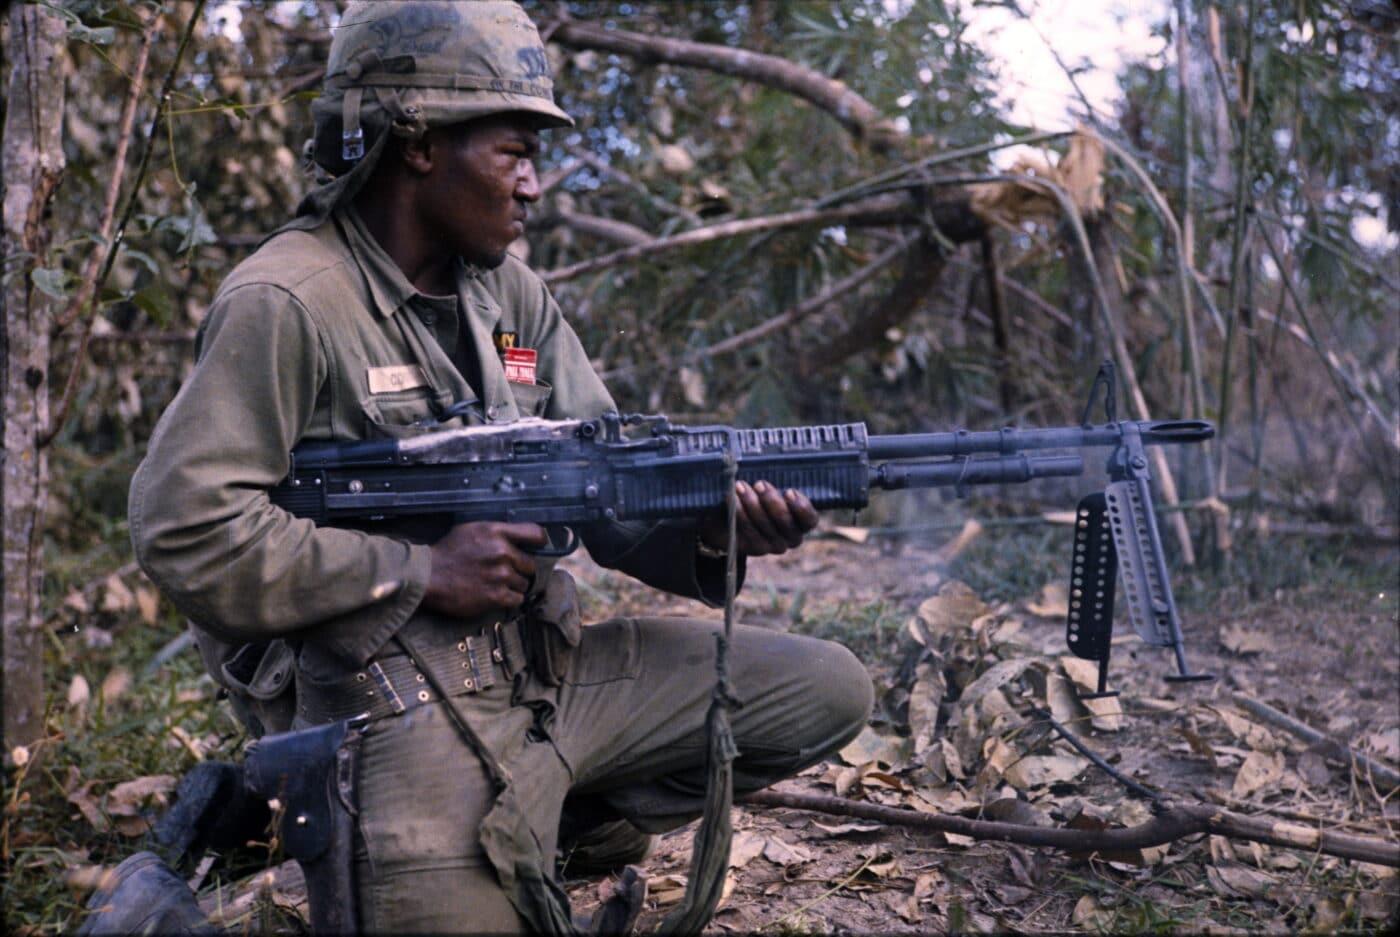 African American army soldier firing M60 in Viet Nam War near Cu Chi